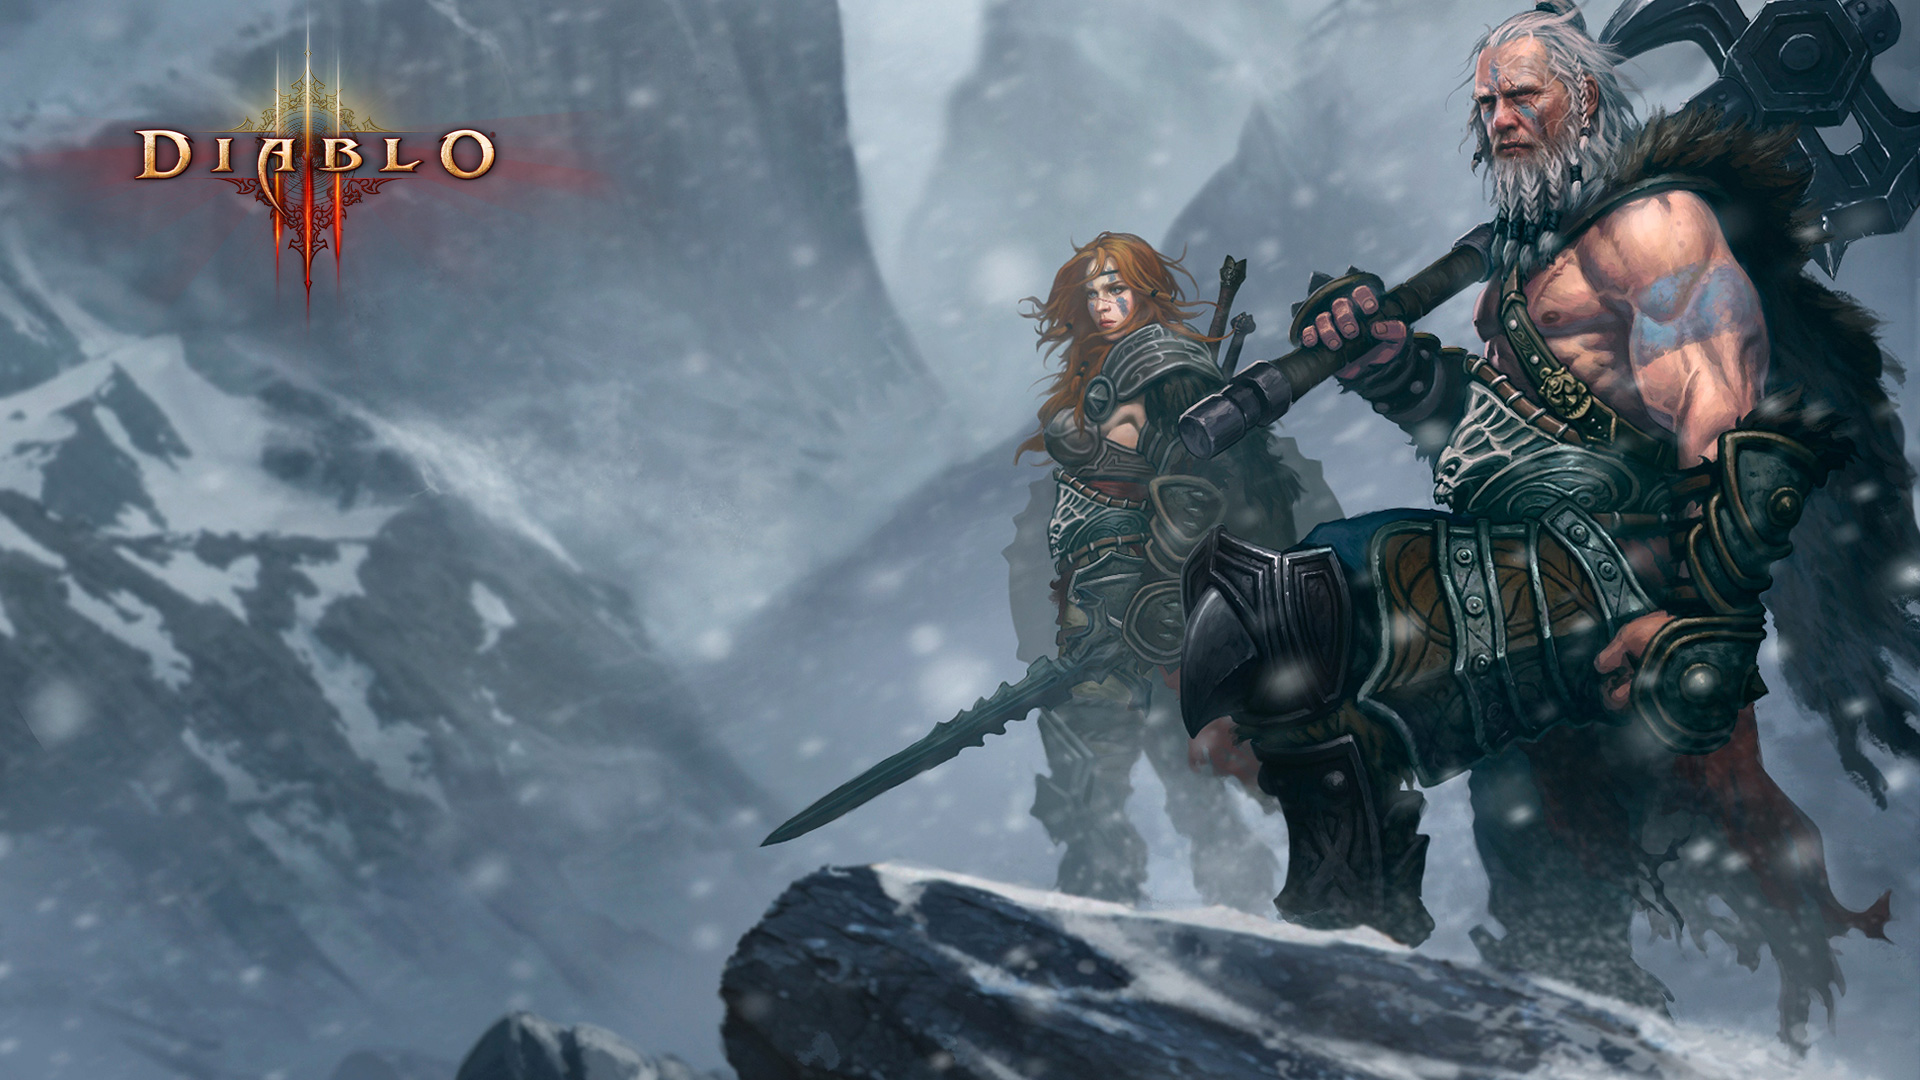 Diablo 3 wallpaper 43